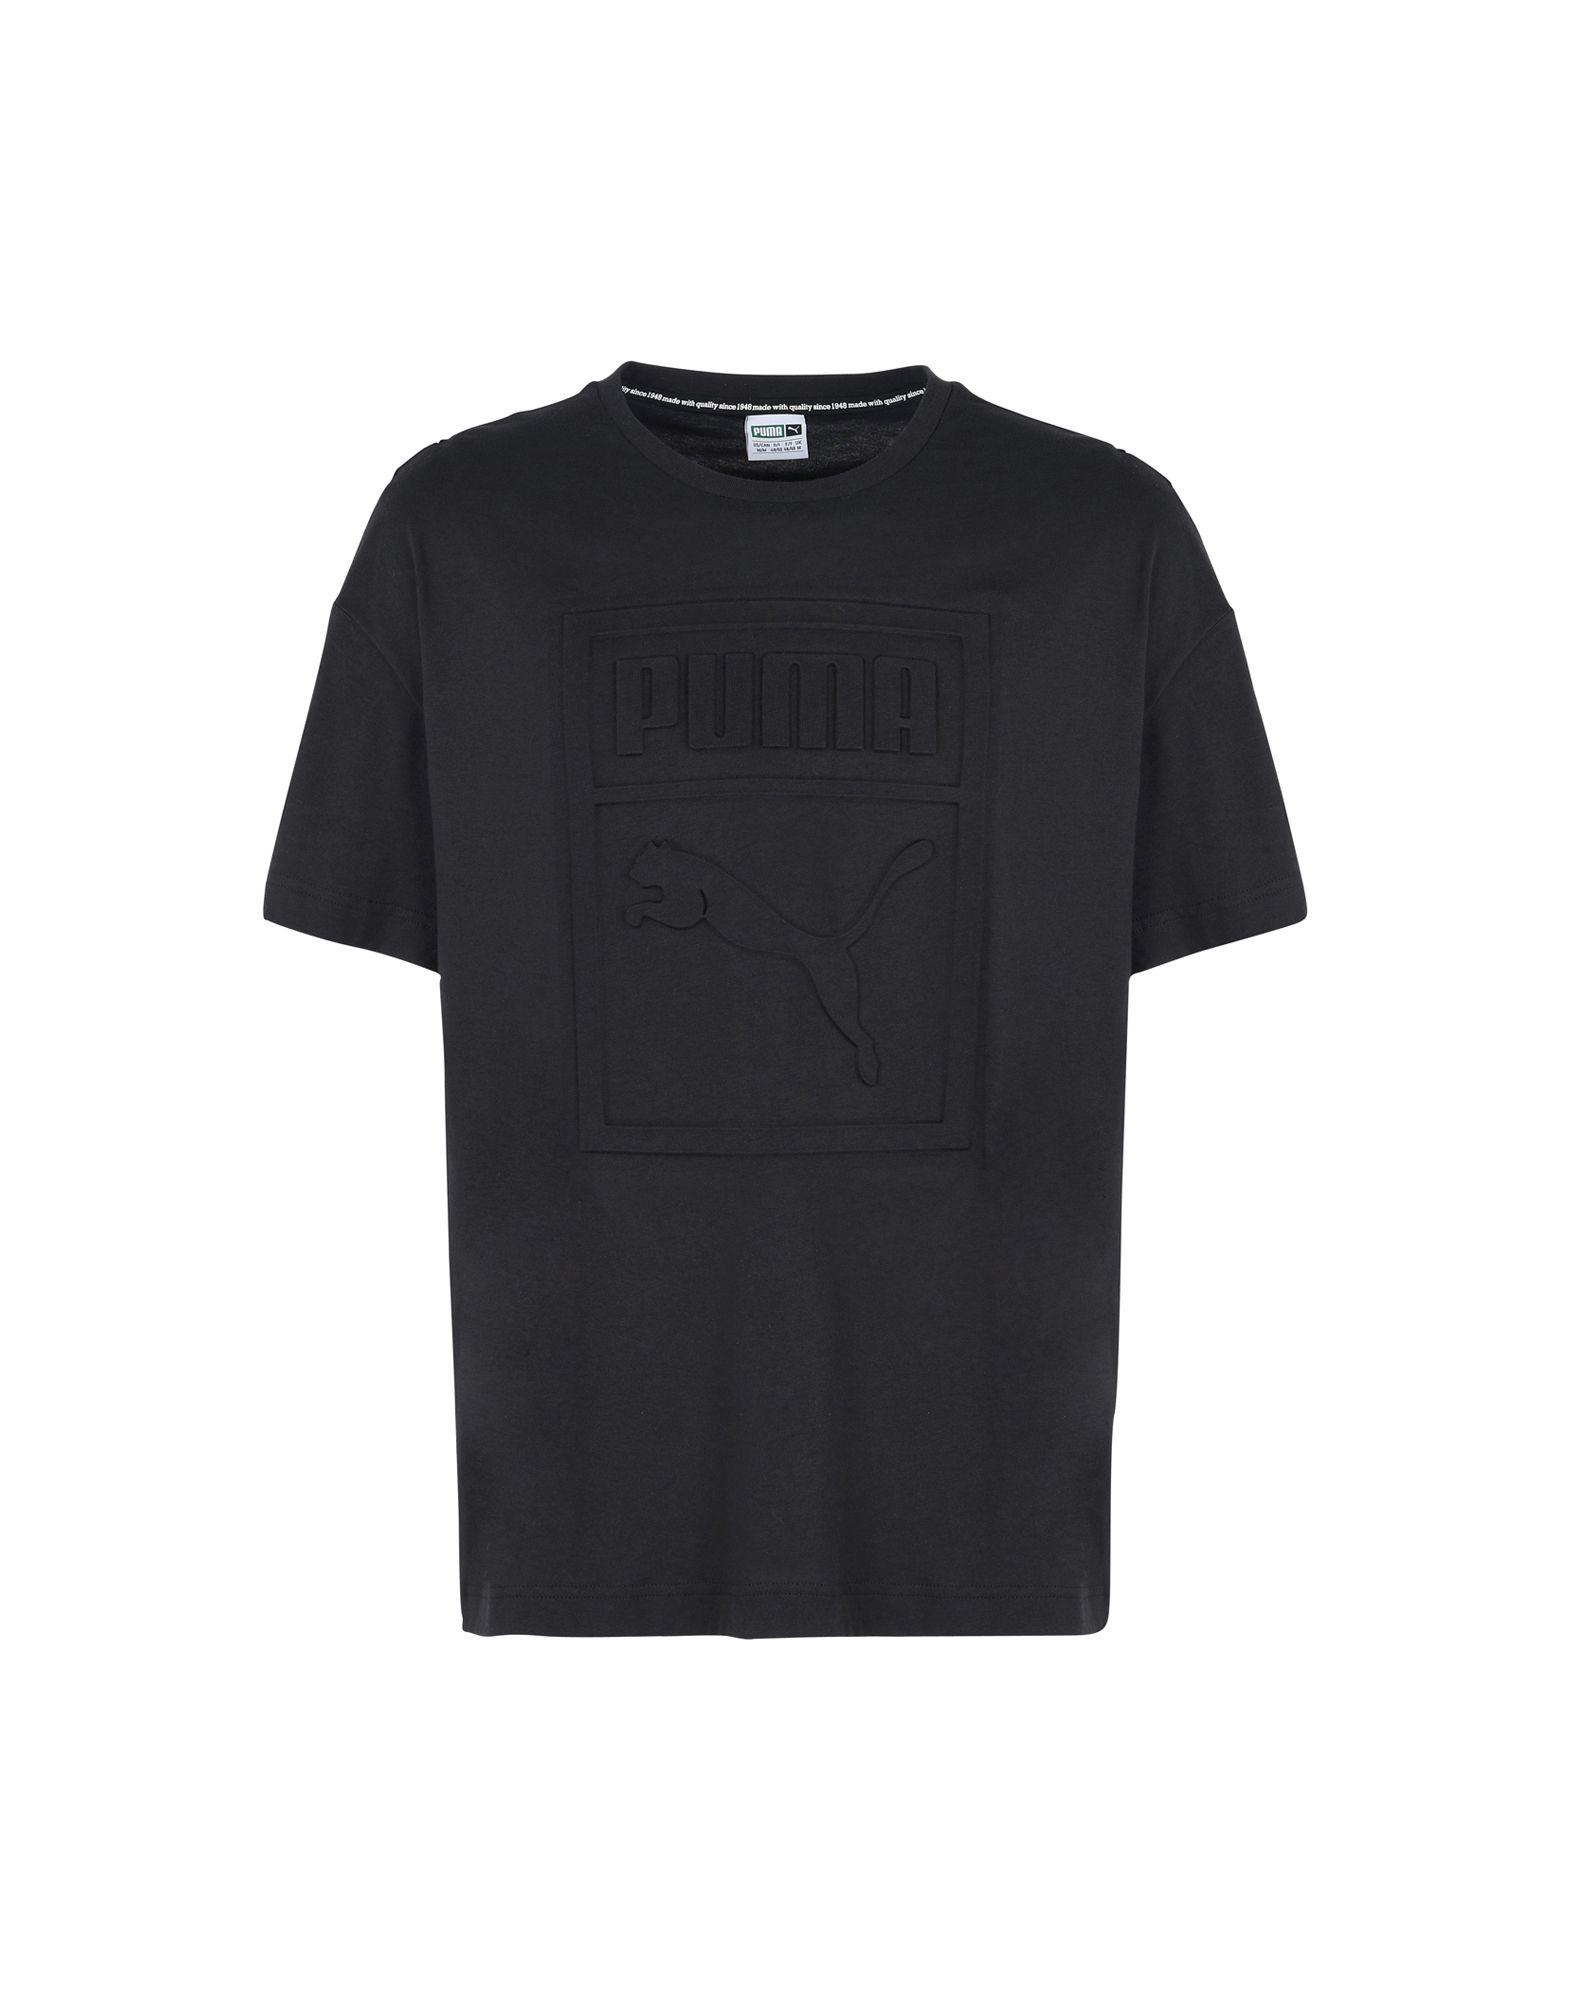 ab79a18ca56 Puma Archive Embossed Print Tee - Sports T-Shirt - Men Puma Sports T-Shirts  online on YOOX United States - 12158642JV